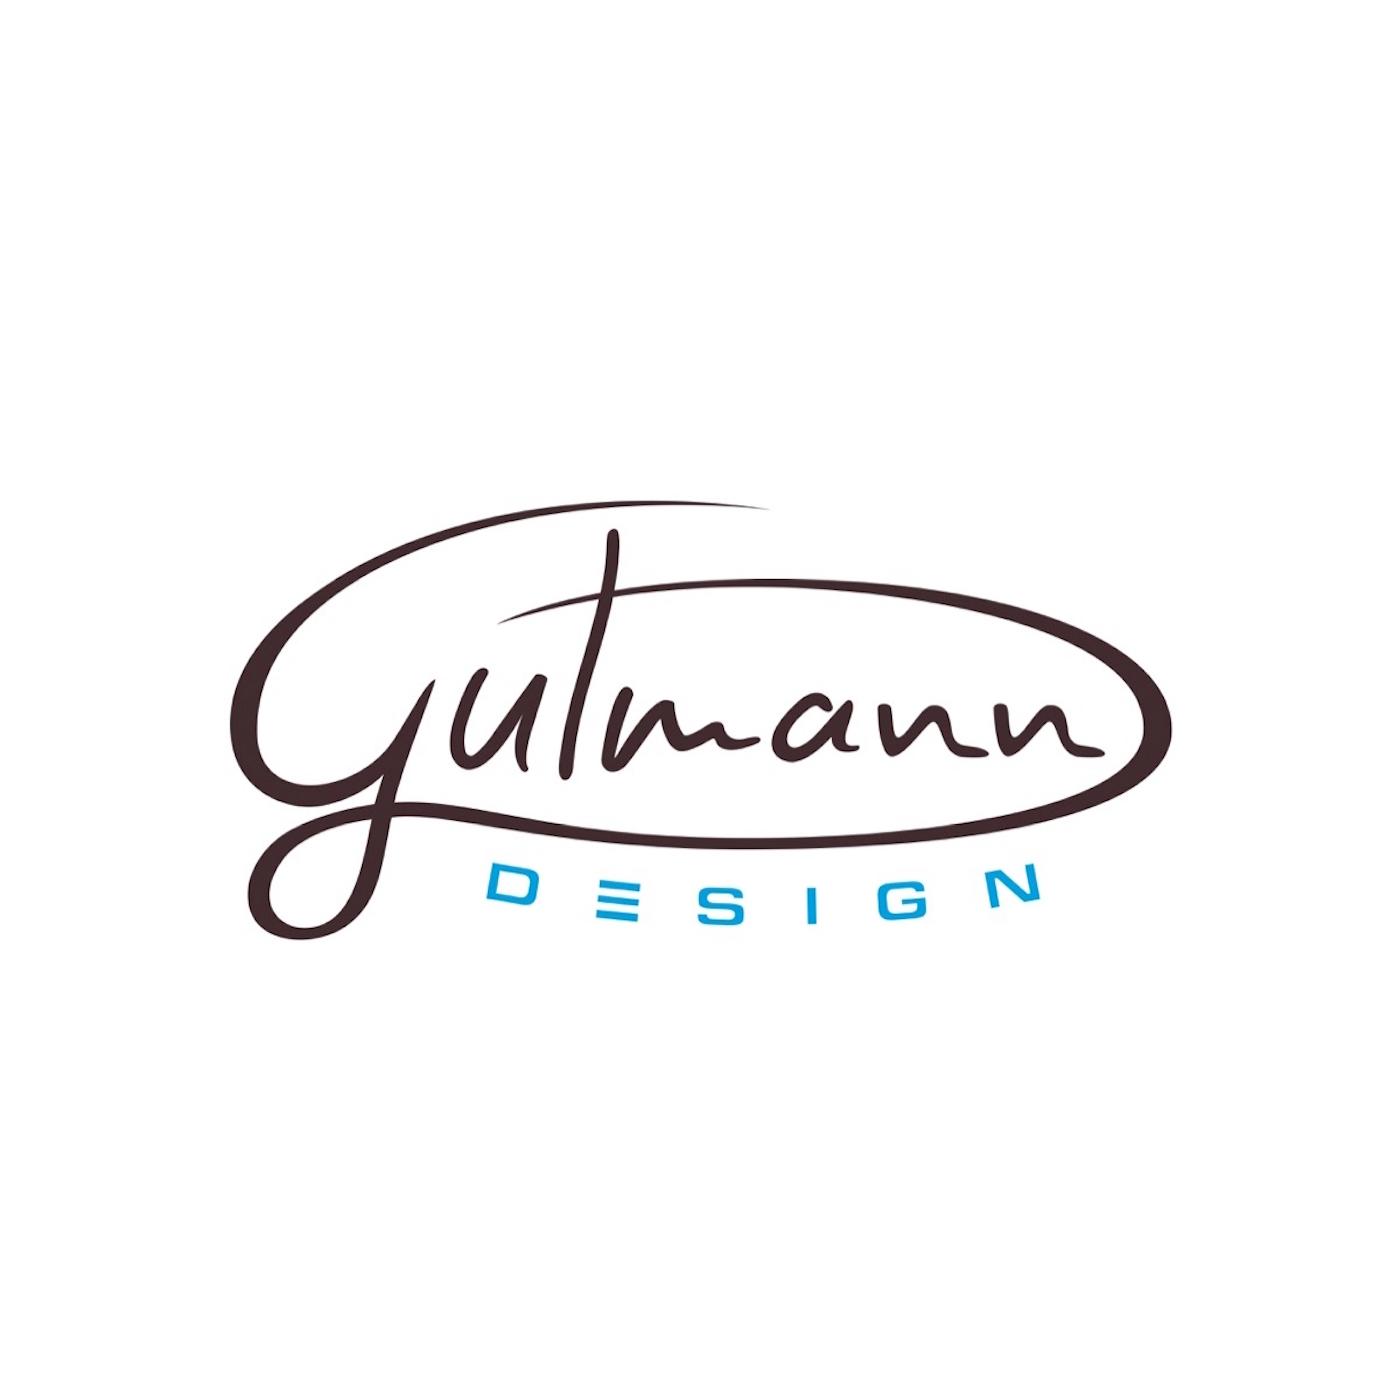 Gutmann – Design